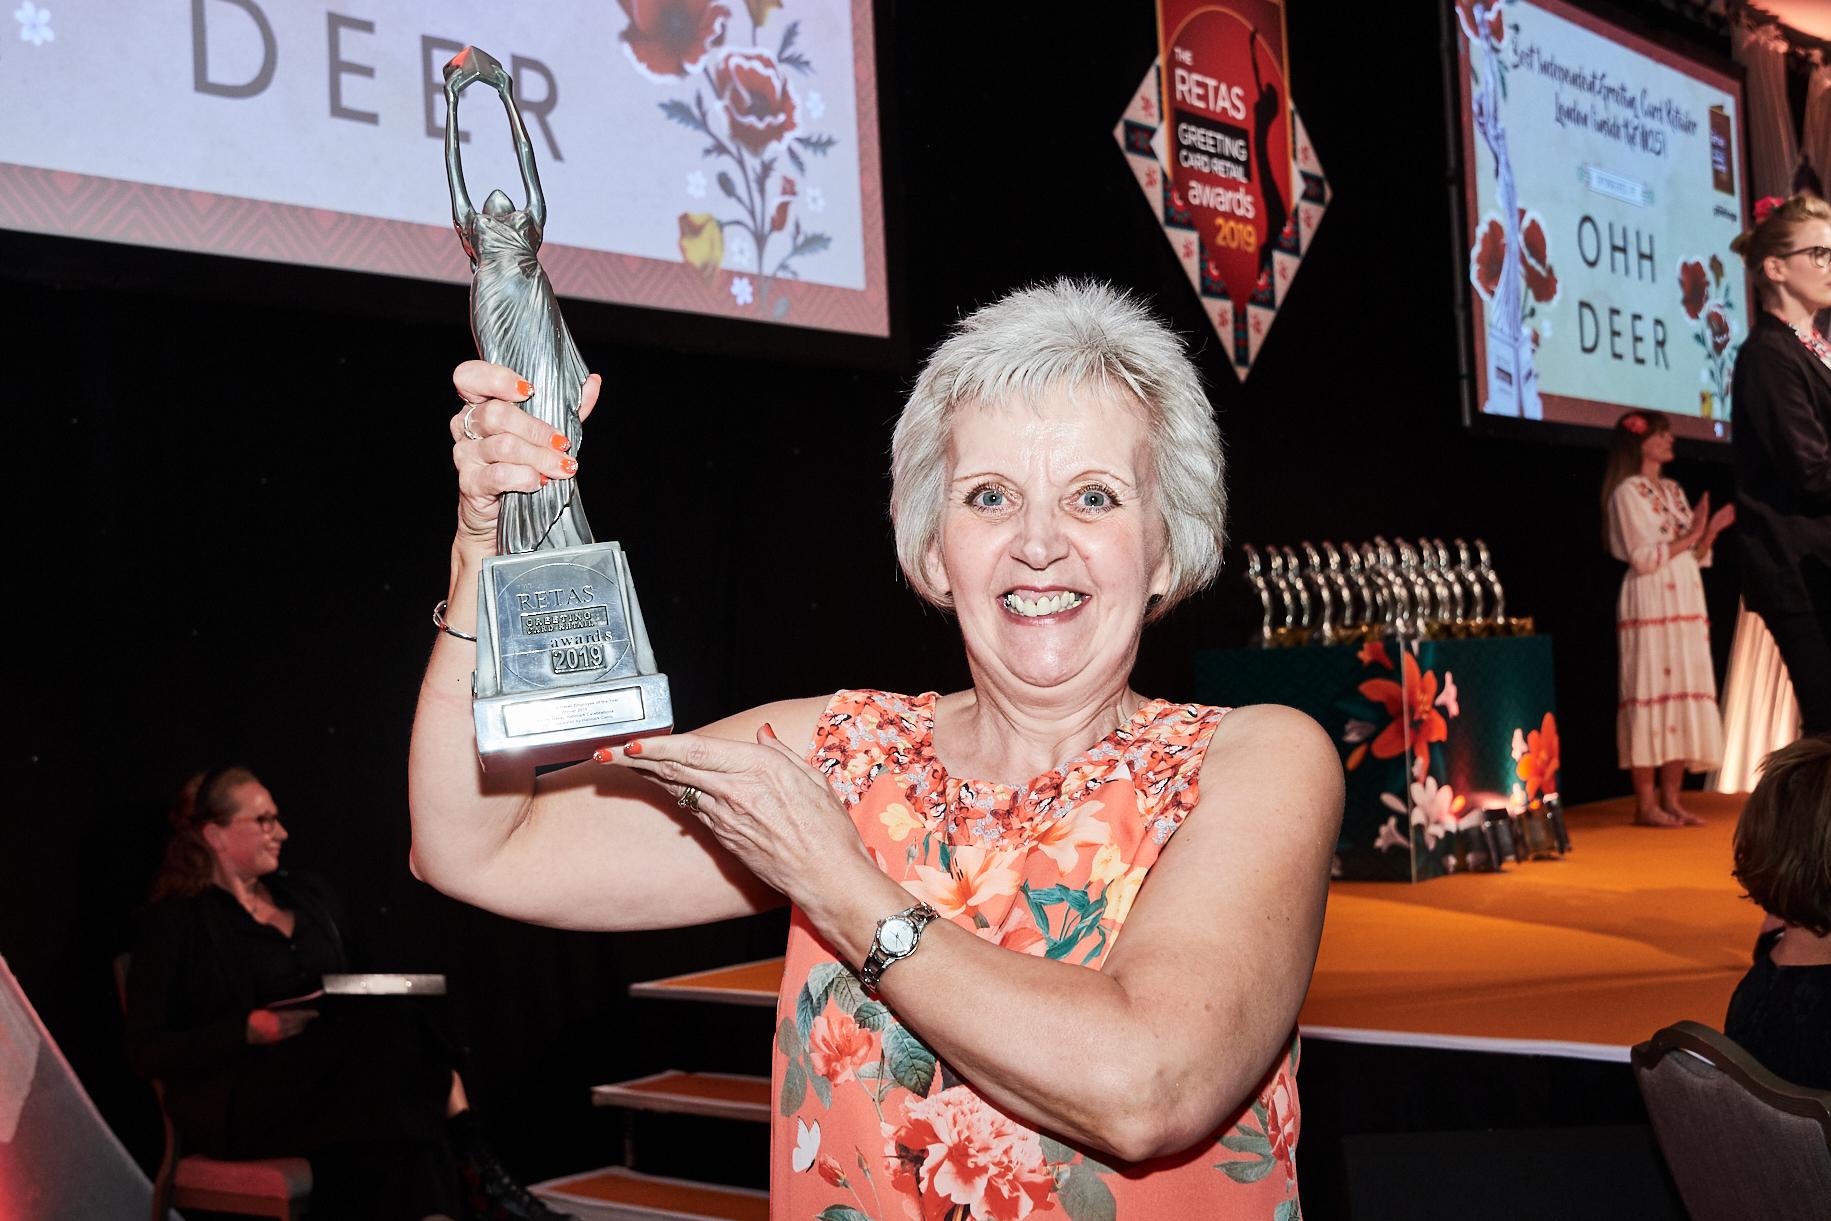 Above: Celebrations' Mandy Baker with her Retas' award trophy.